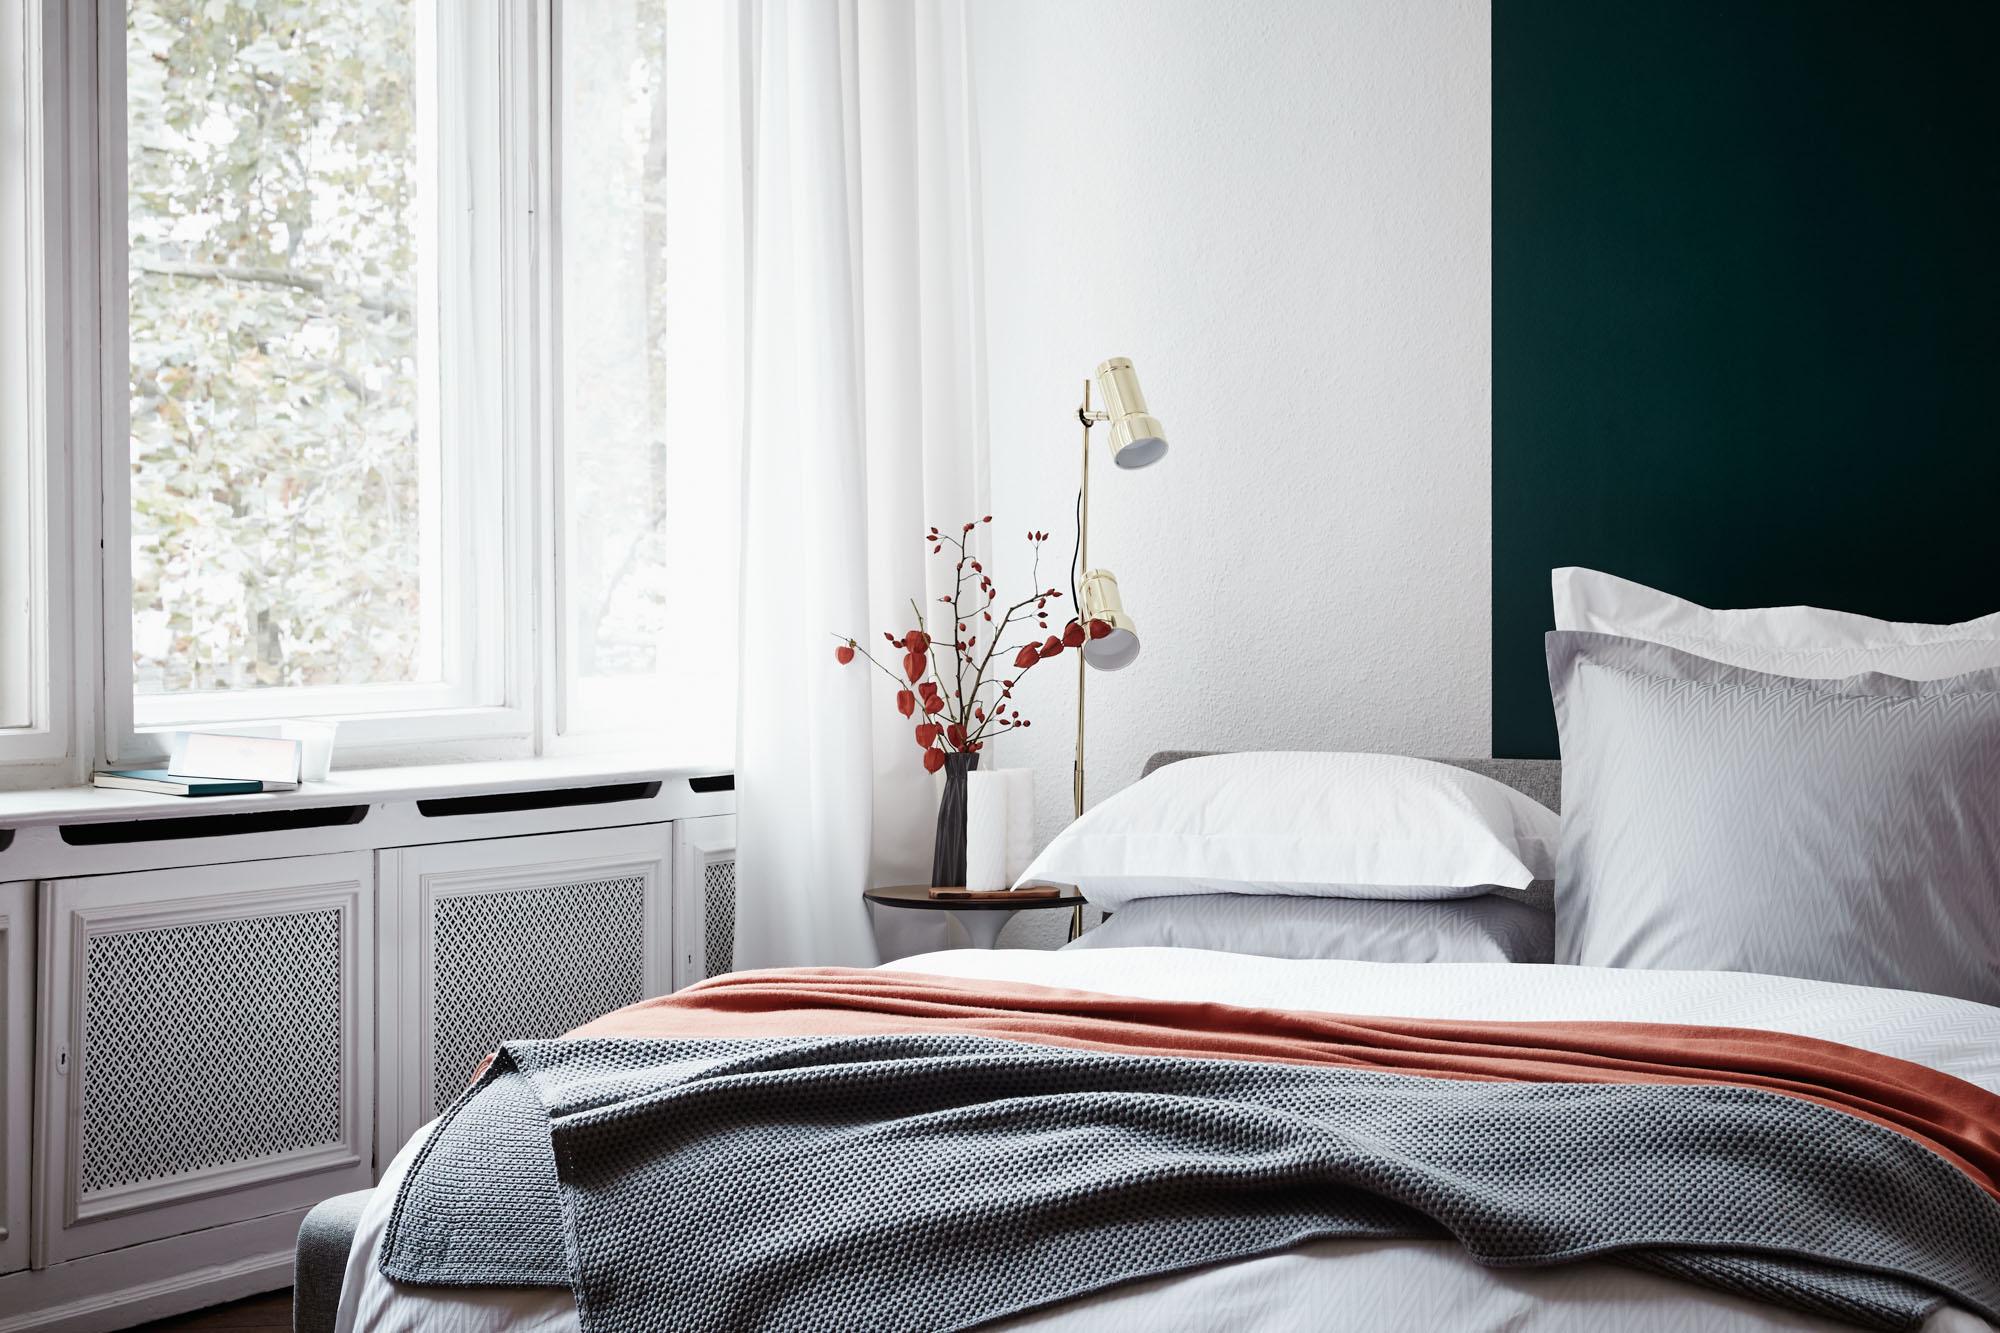 Bedroom sorrento 25.09.14 0166_RGB.jpg